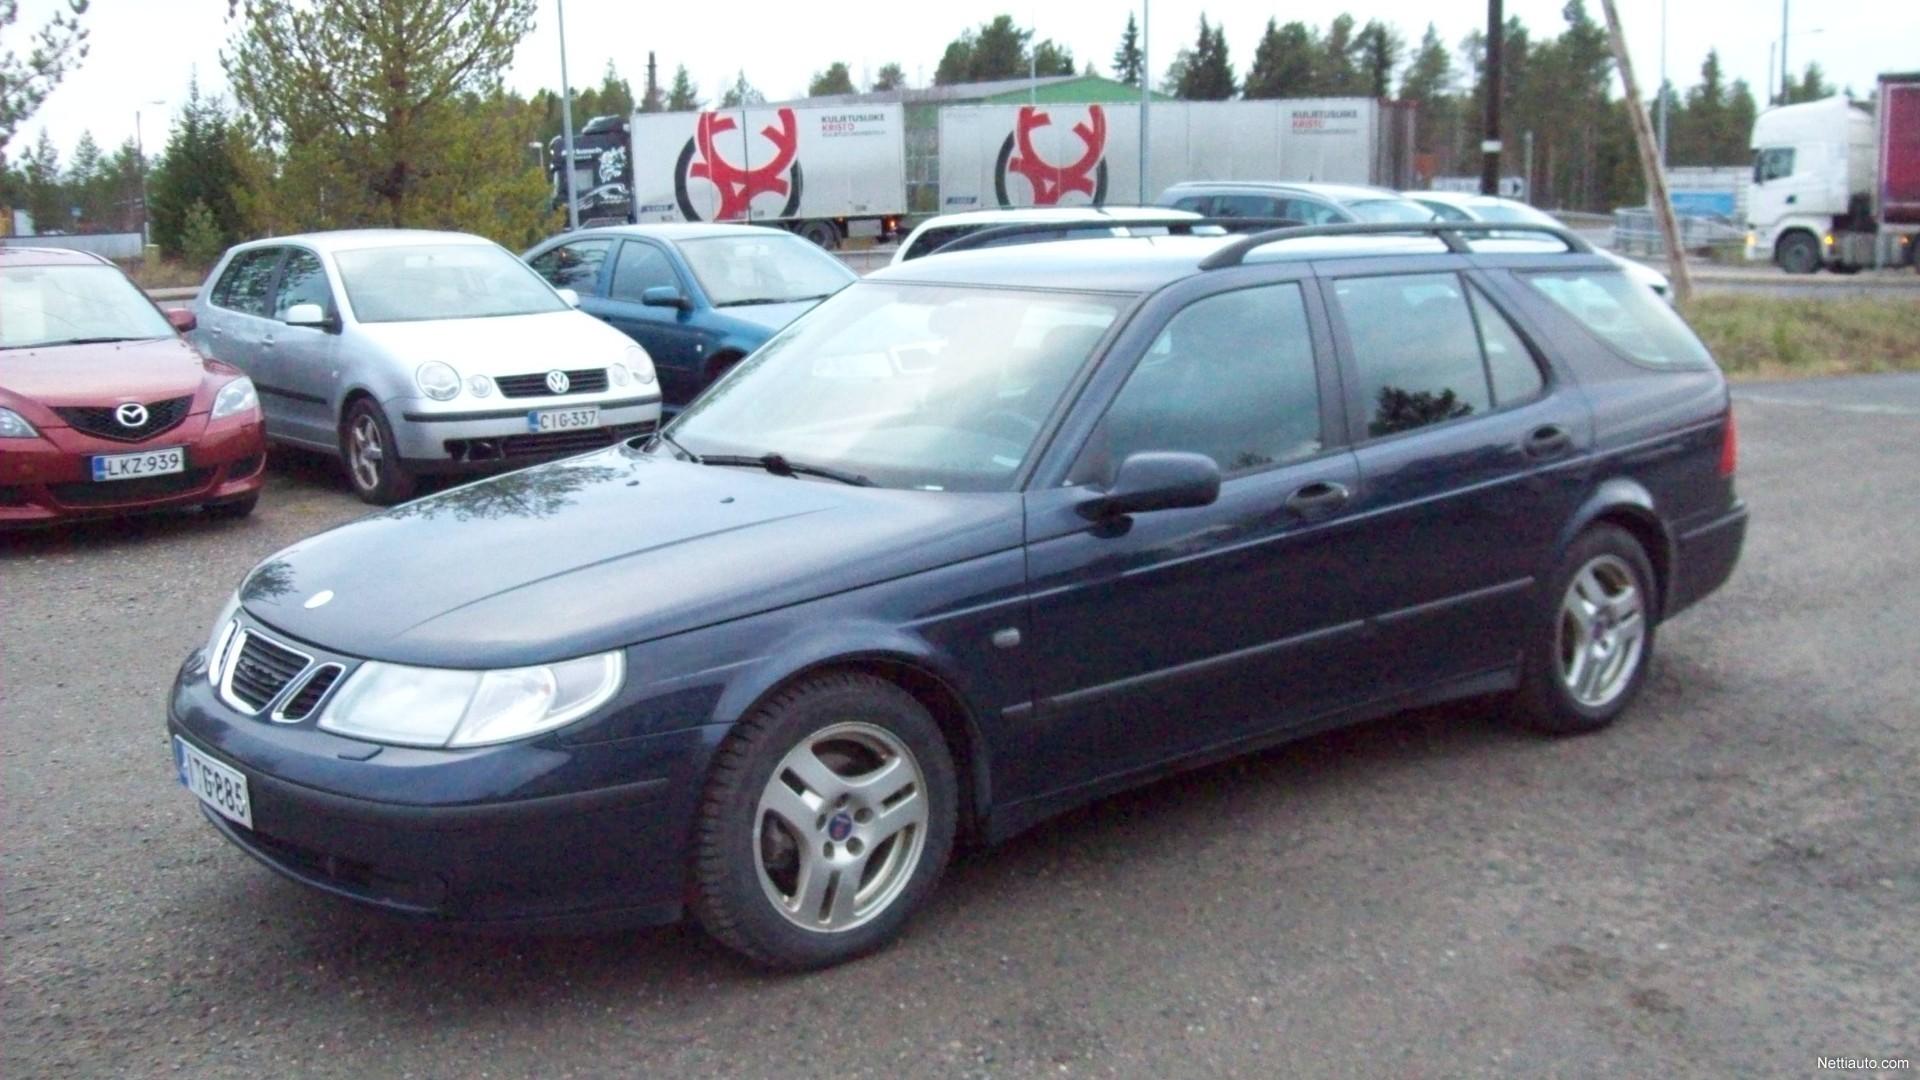 saab 9 5 2 3t linear wagon a rahoitus j rjestyy ilman k sirahaa kk rh nettiauto com Silver 2008 Saab 9-7X Silver 2008 Saab 9-7X